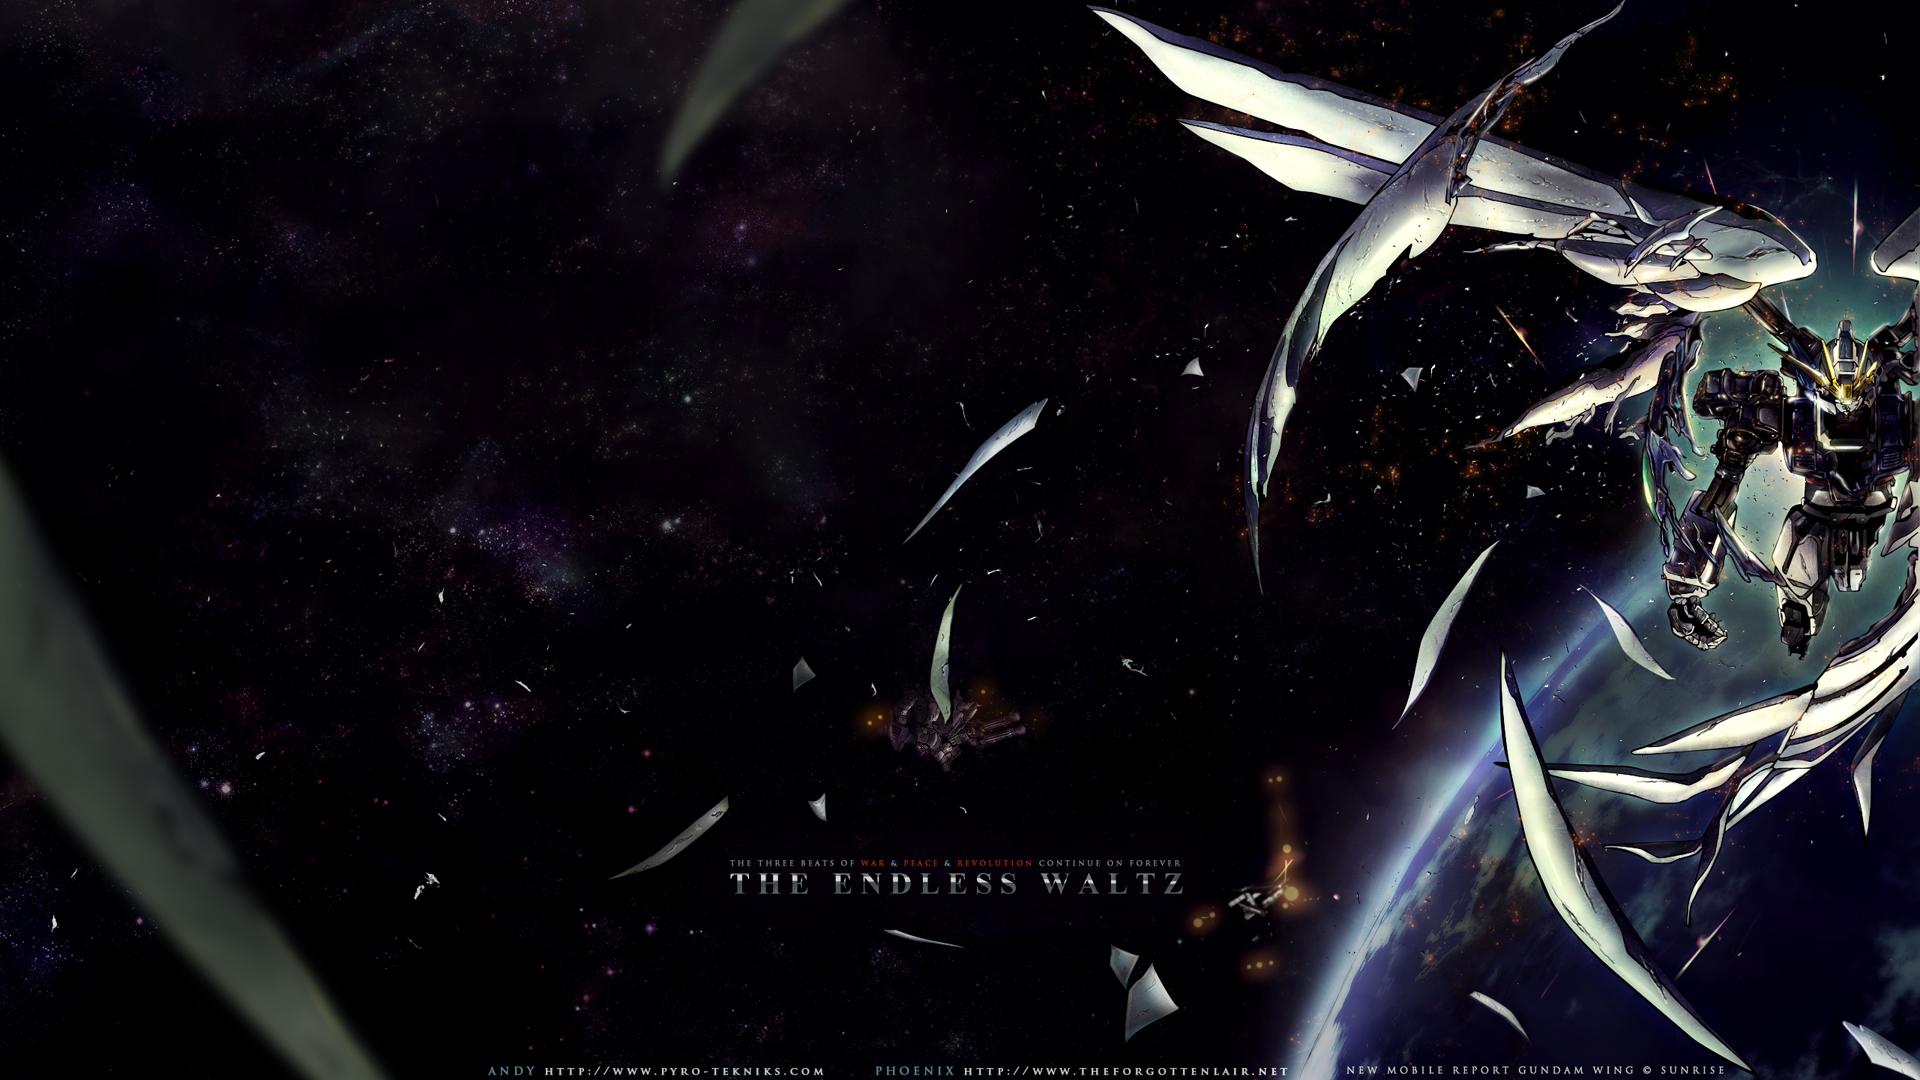 Mobile Suit Gundam 0079 Wallpaper Mobile Suit Gundam Wallpaper 1920x1080